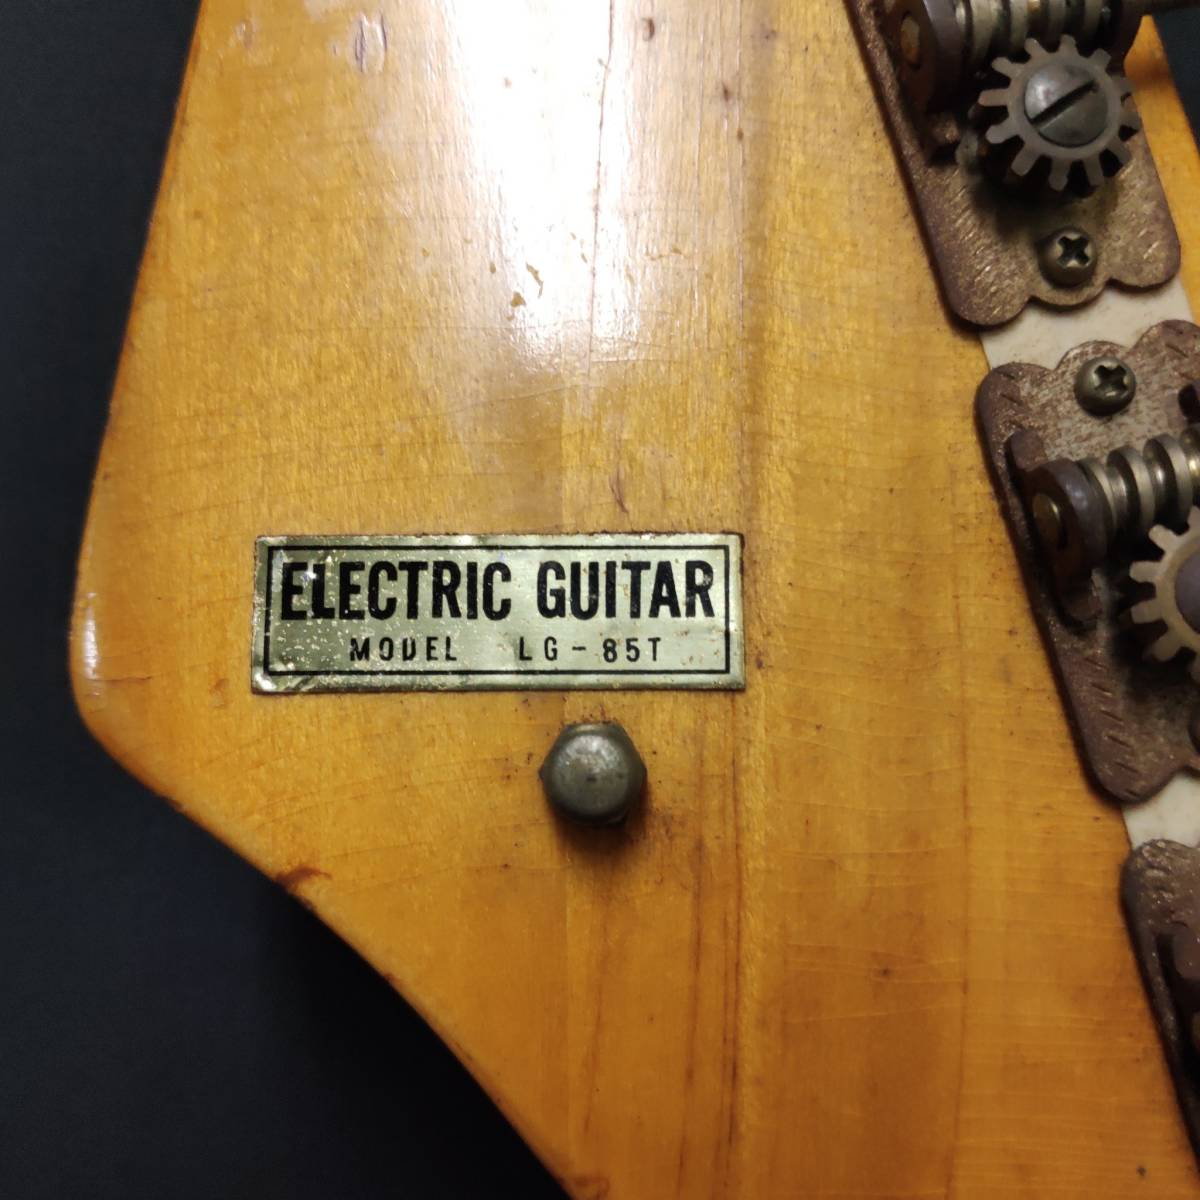 A22m11T GUYA TONE エレキギター LG-85T 本体 約100cm グヤトーン ビンテージ レッド 赤色_画像6